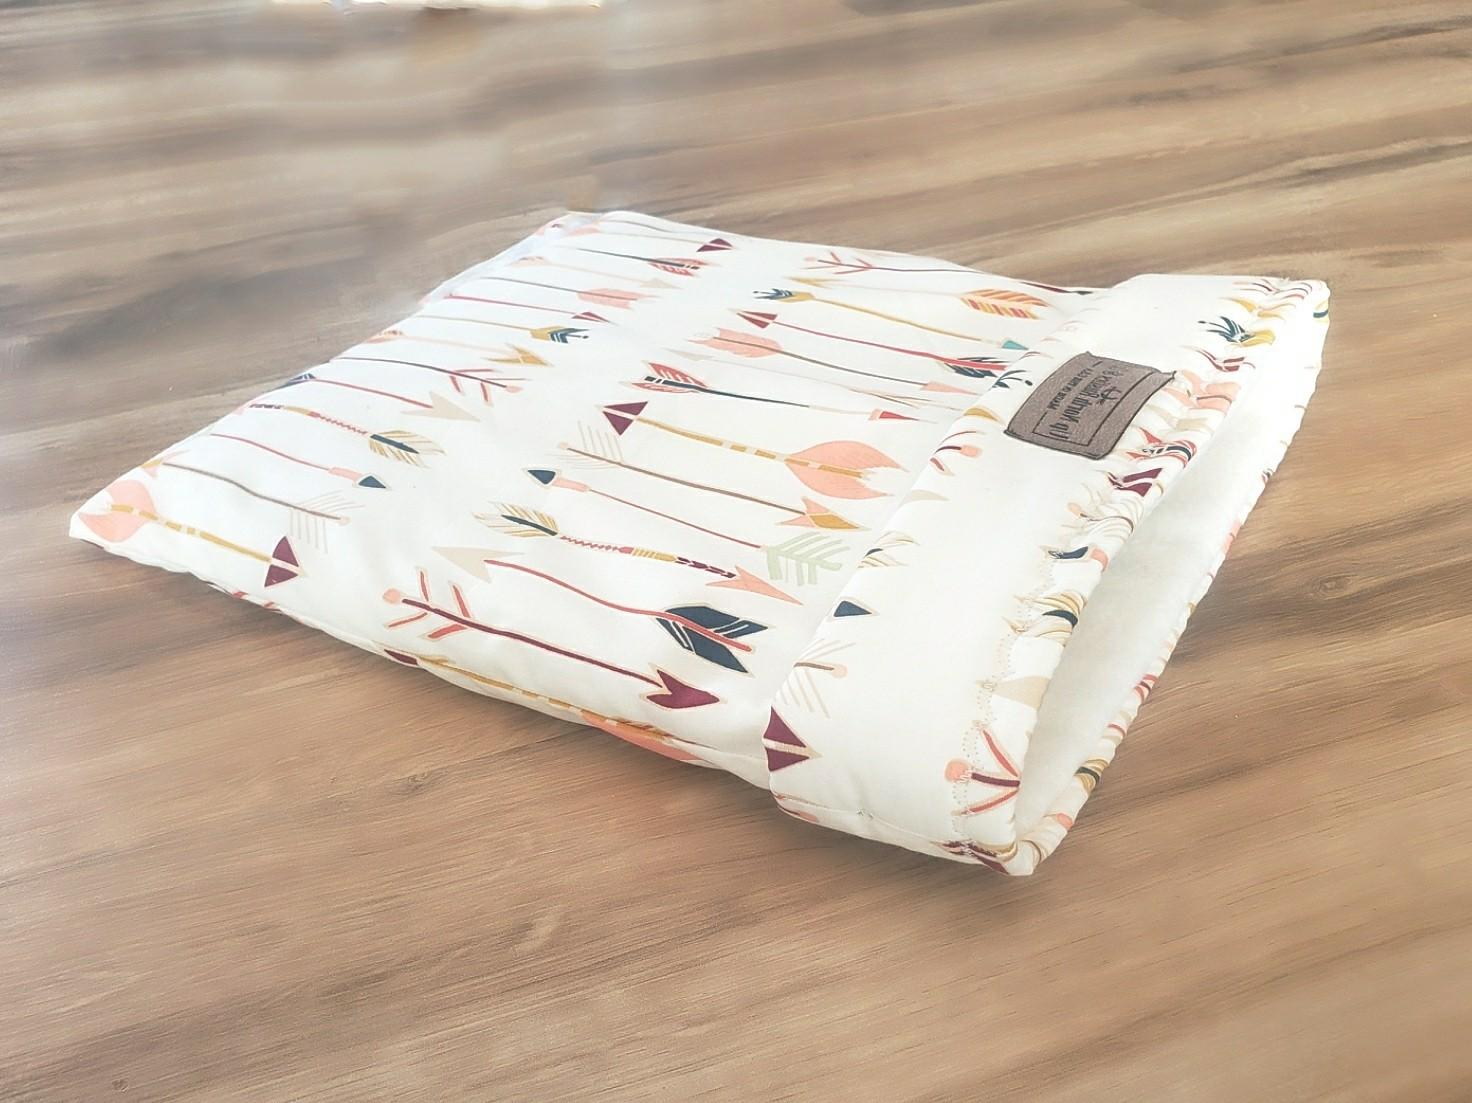 Up North Rustics & Co.™ Small Animal Sleep & Snuggle Sack | Multi- Colored Arrows on Tan